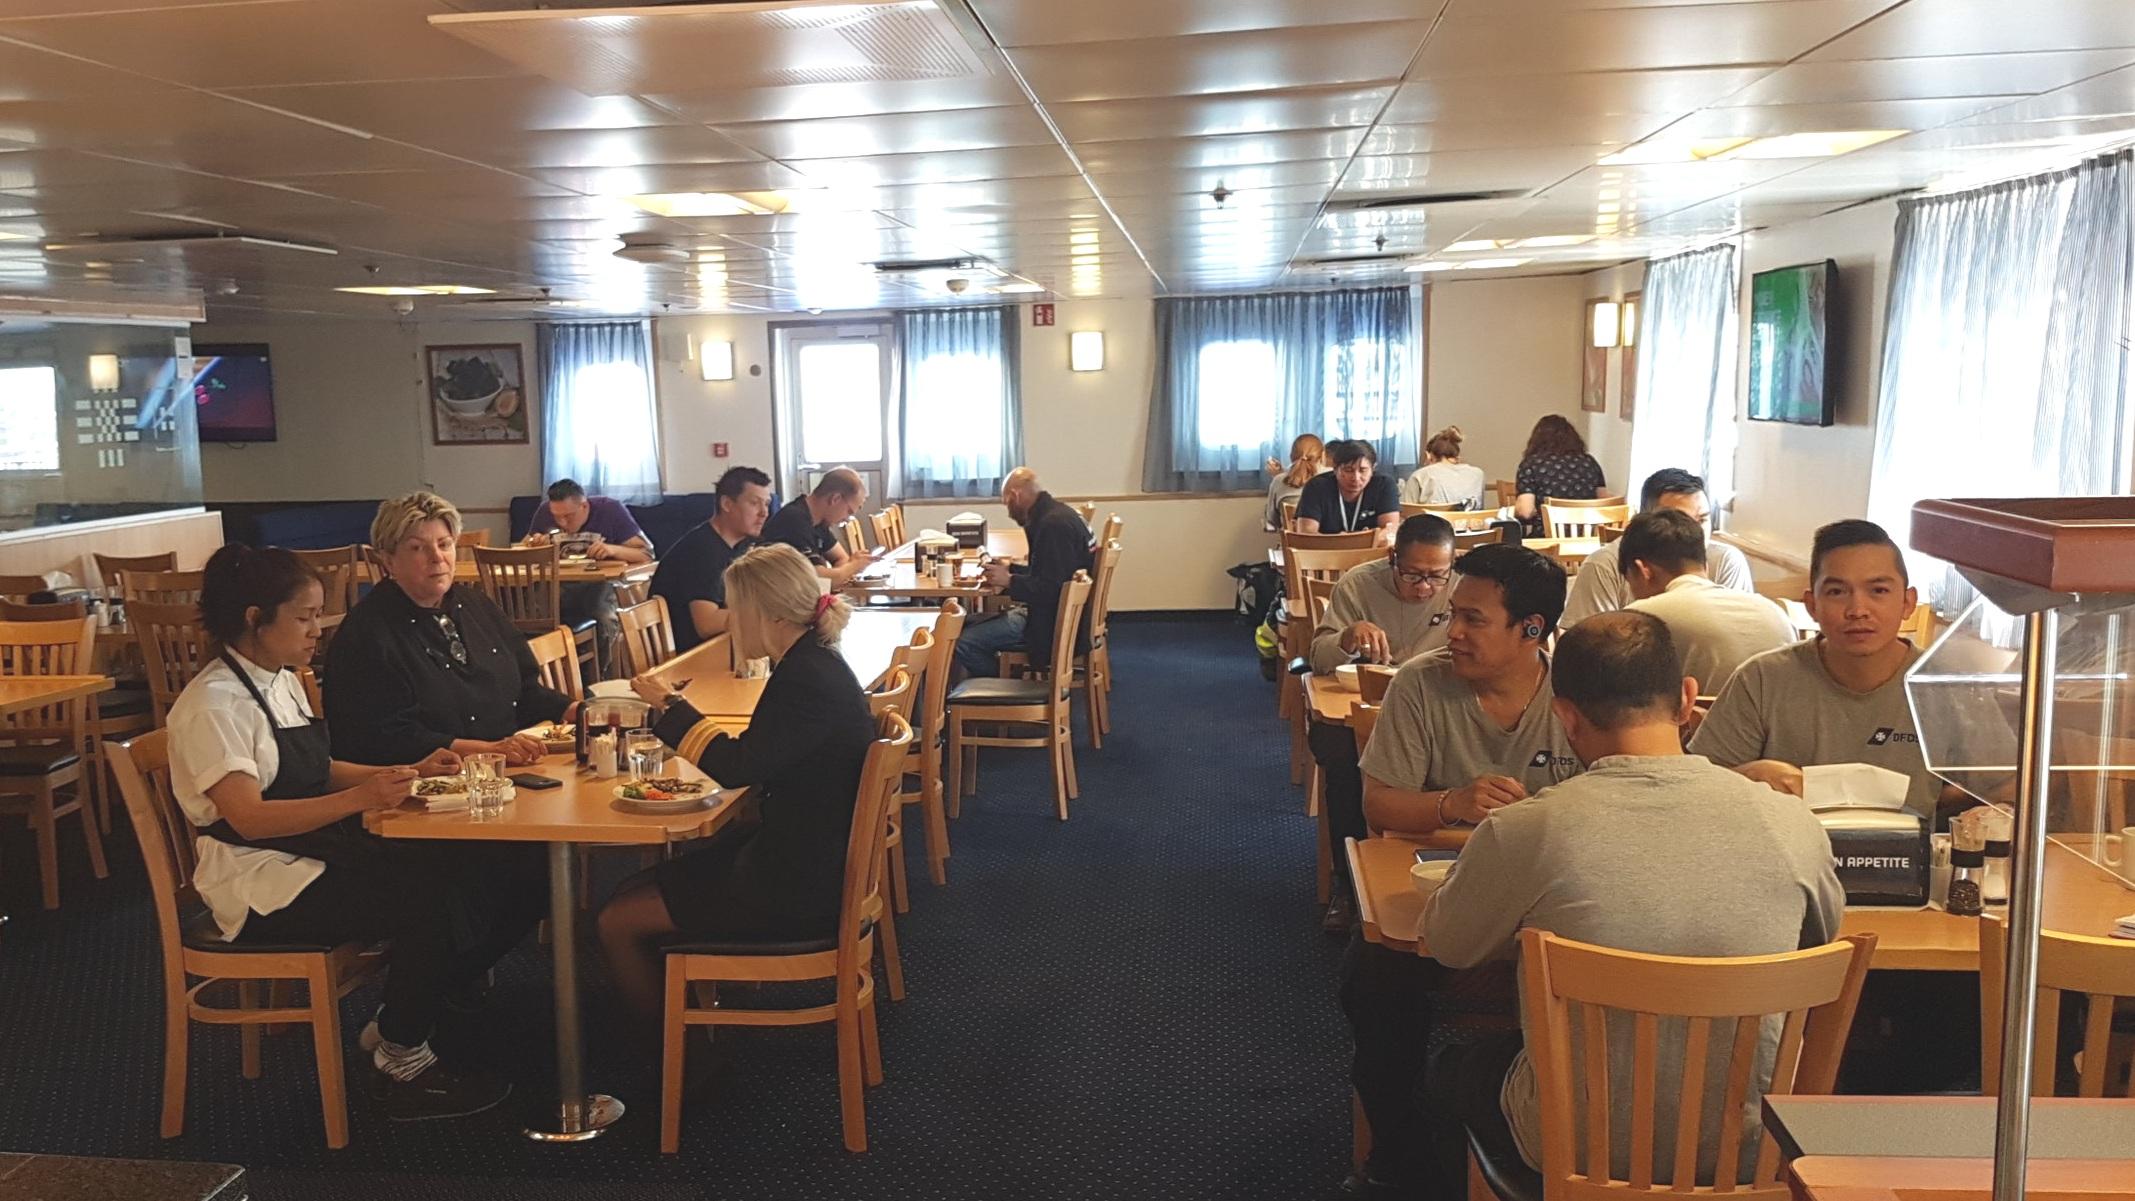 Messen er lagt sammen på KING SEAWAYS, så alle besætningsmedlemmer spiser sammen.